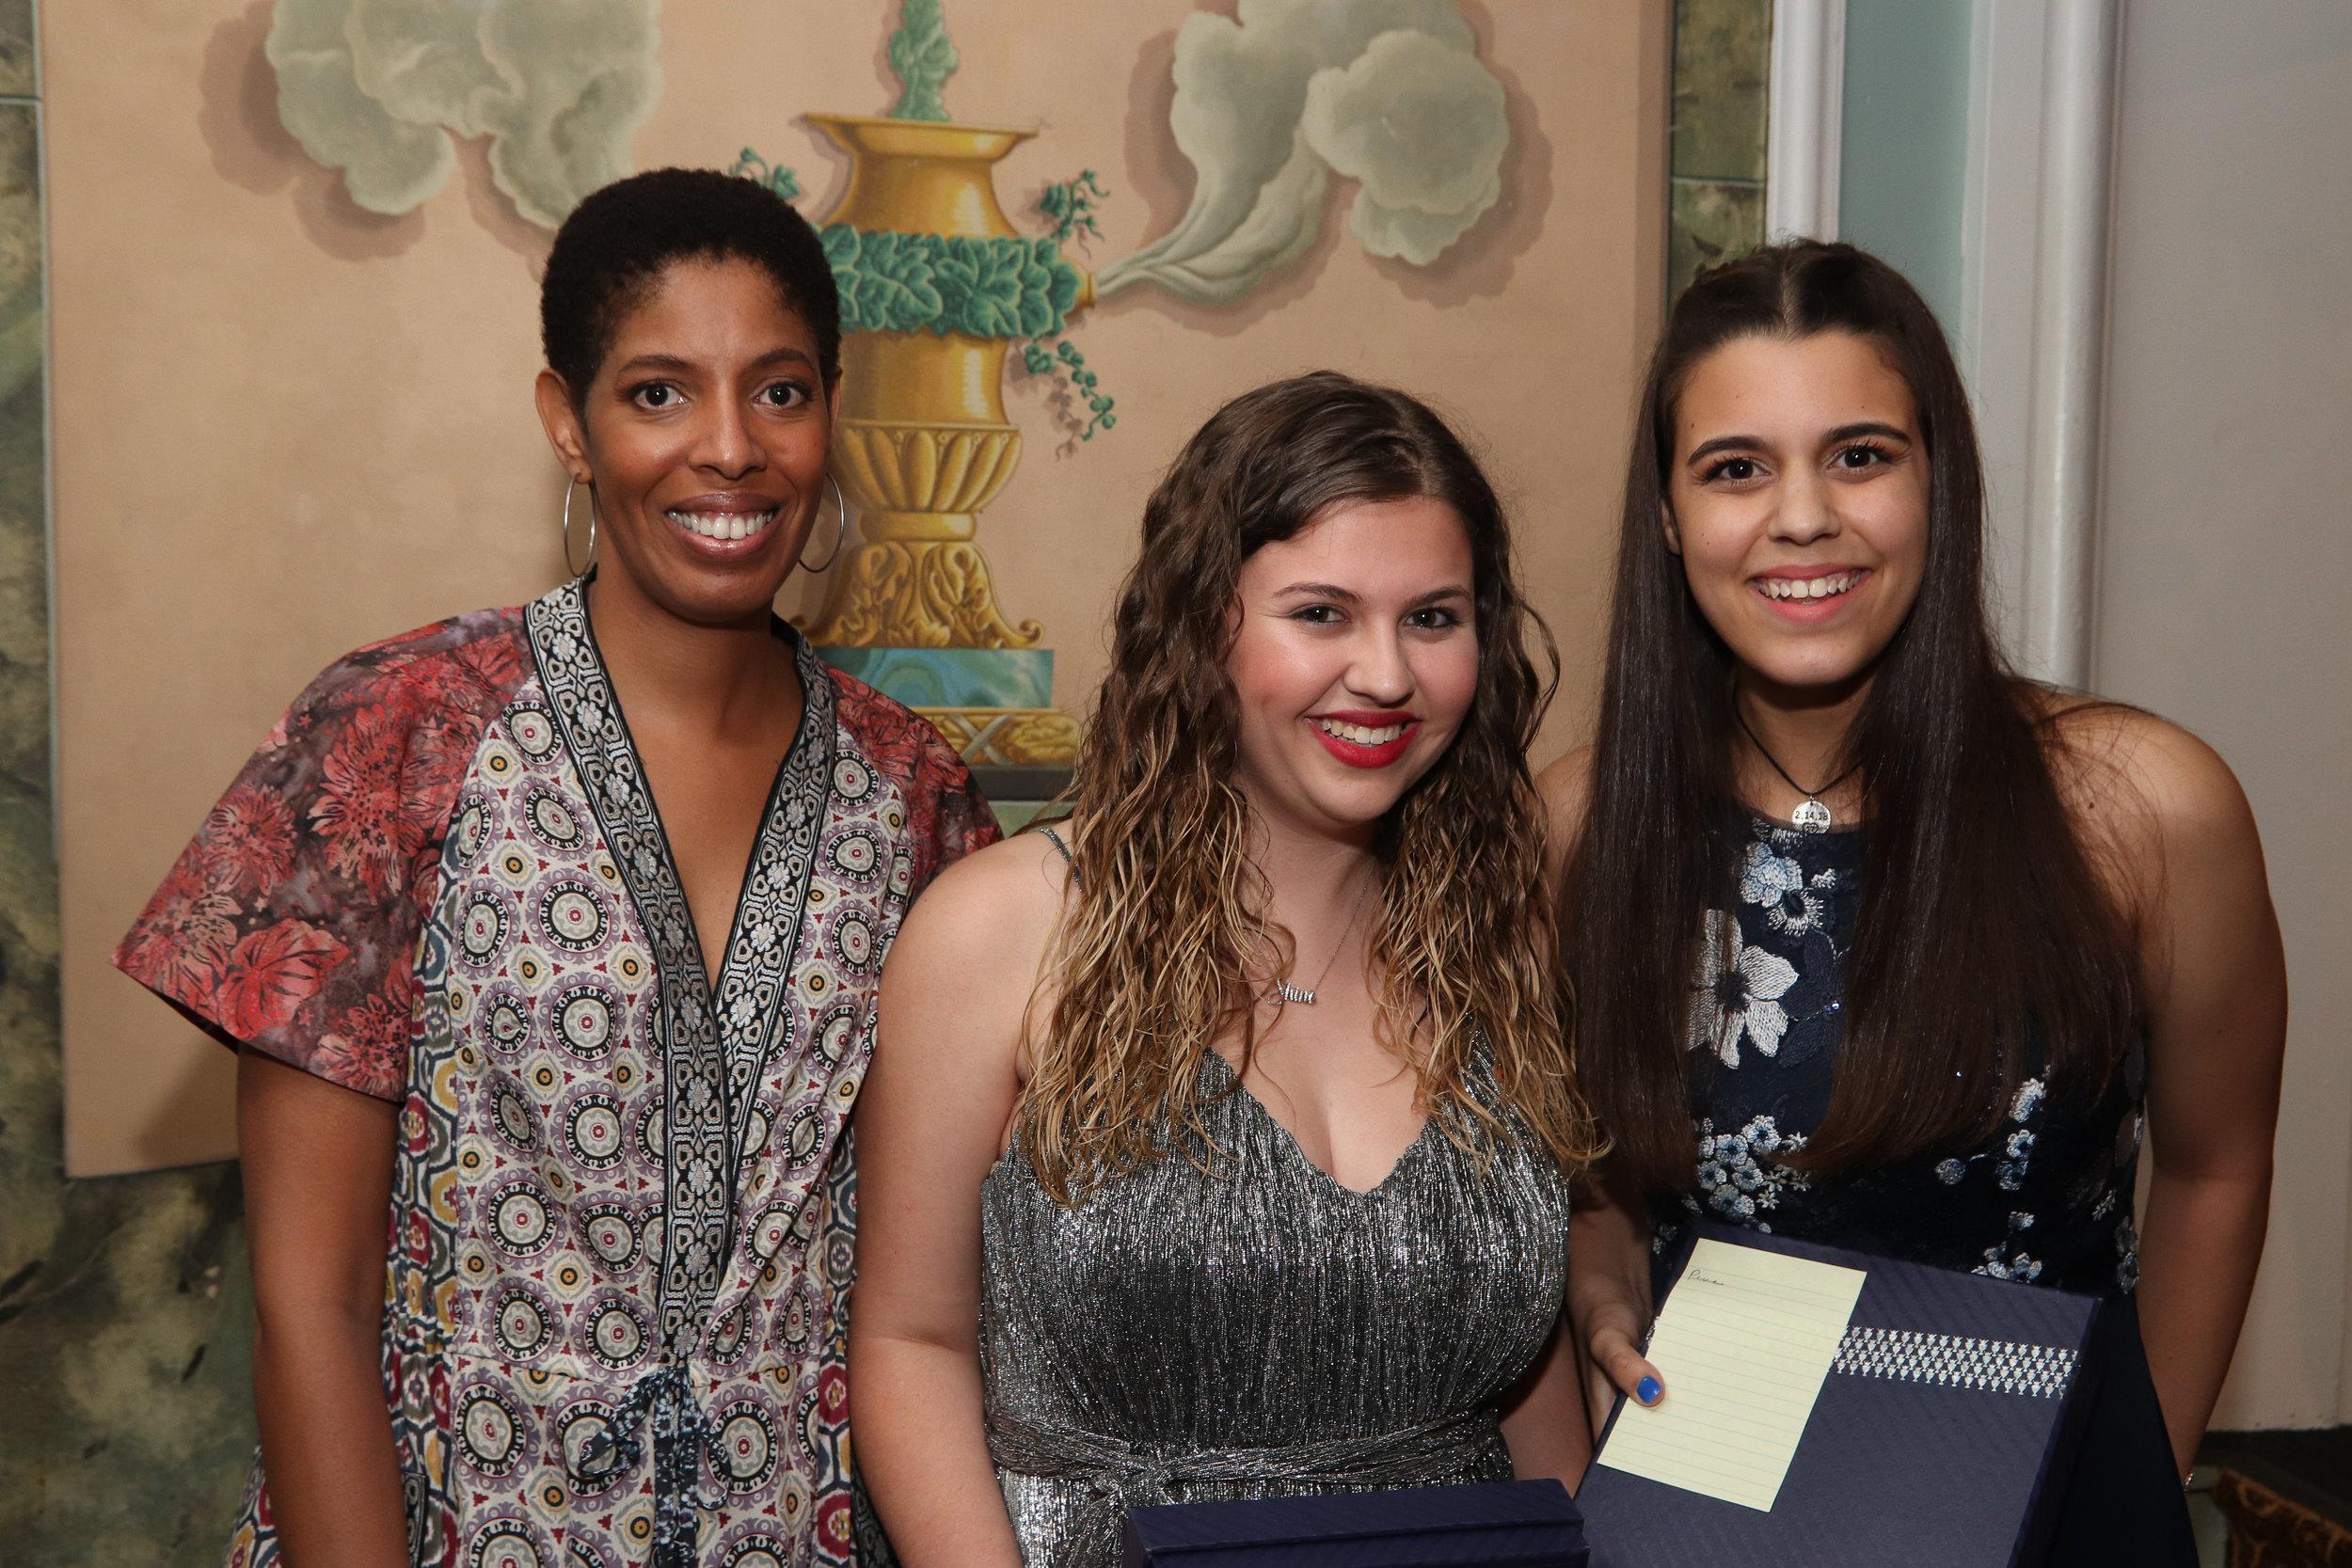 DLDF Board member Lydia Diamond and 2018 Defener award winners Sawyer Garrity and Andrea Peña